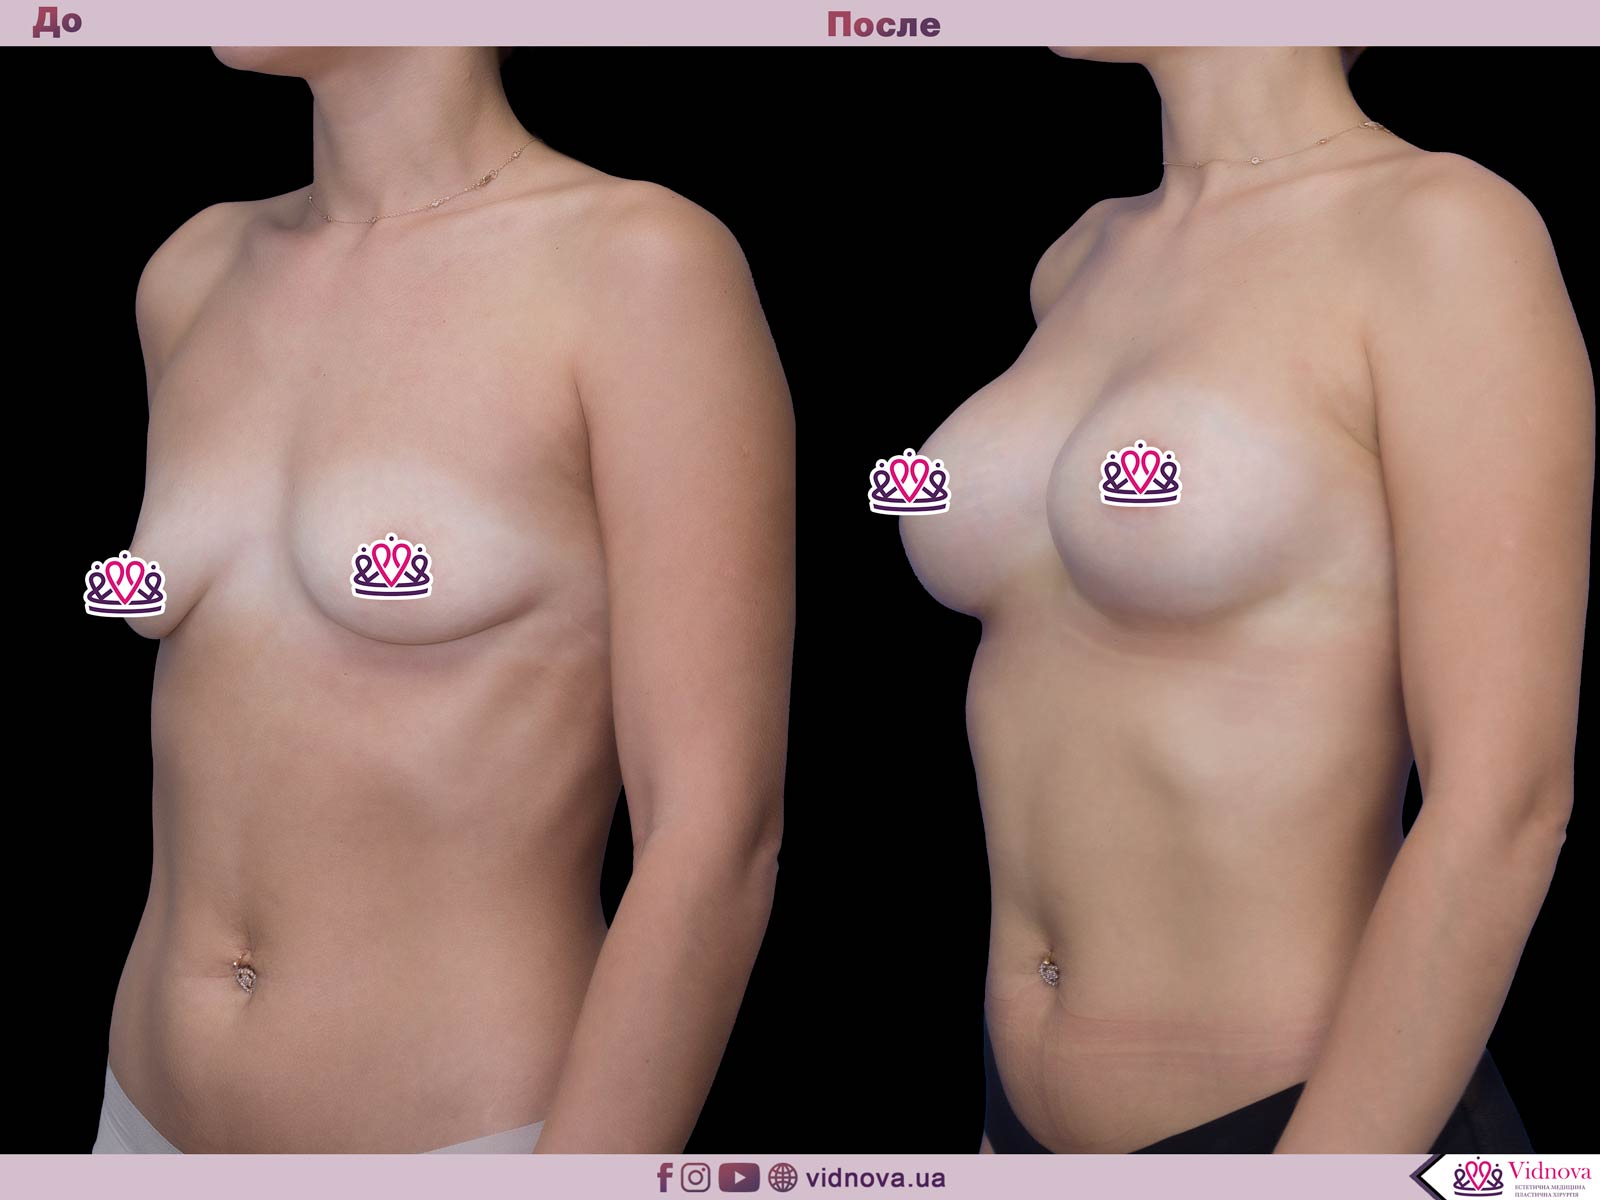 Увеличение груди: Фото ДО и ПОСЛЕ - Пример №49-2 - Клиника Vidnova